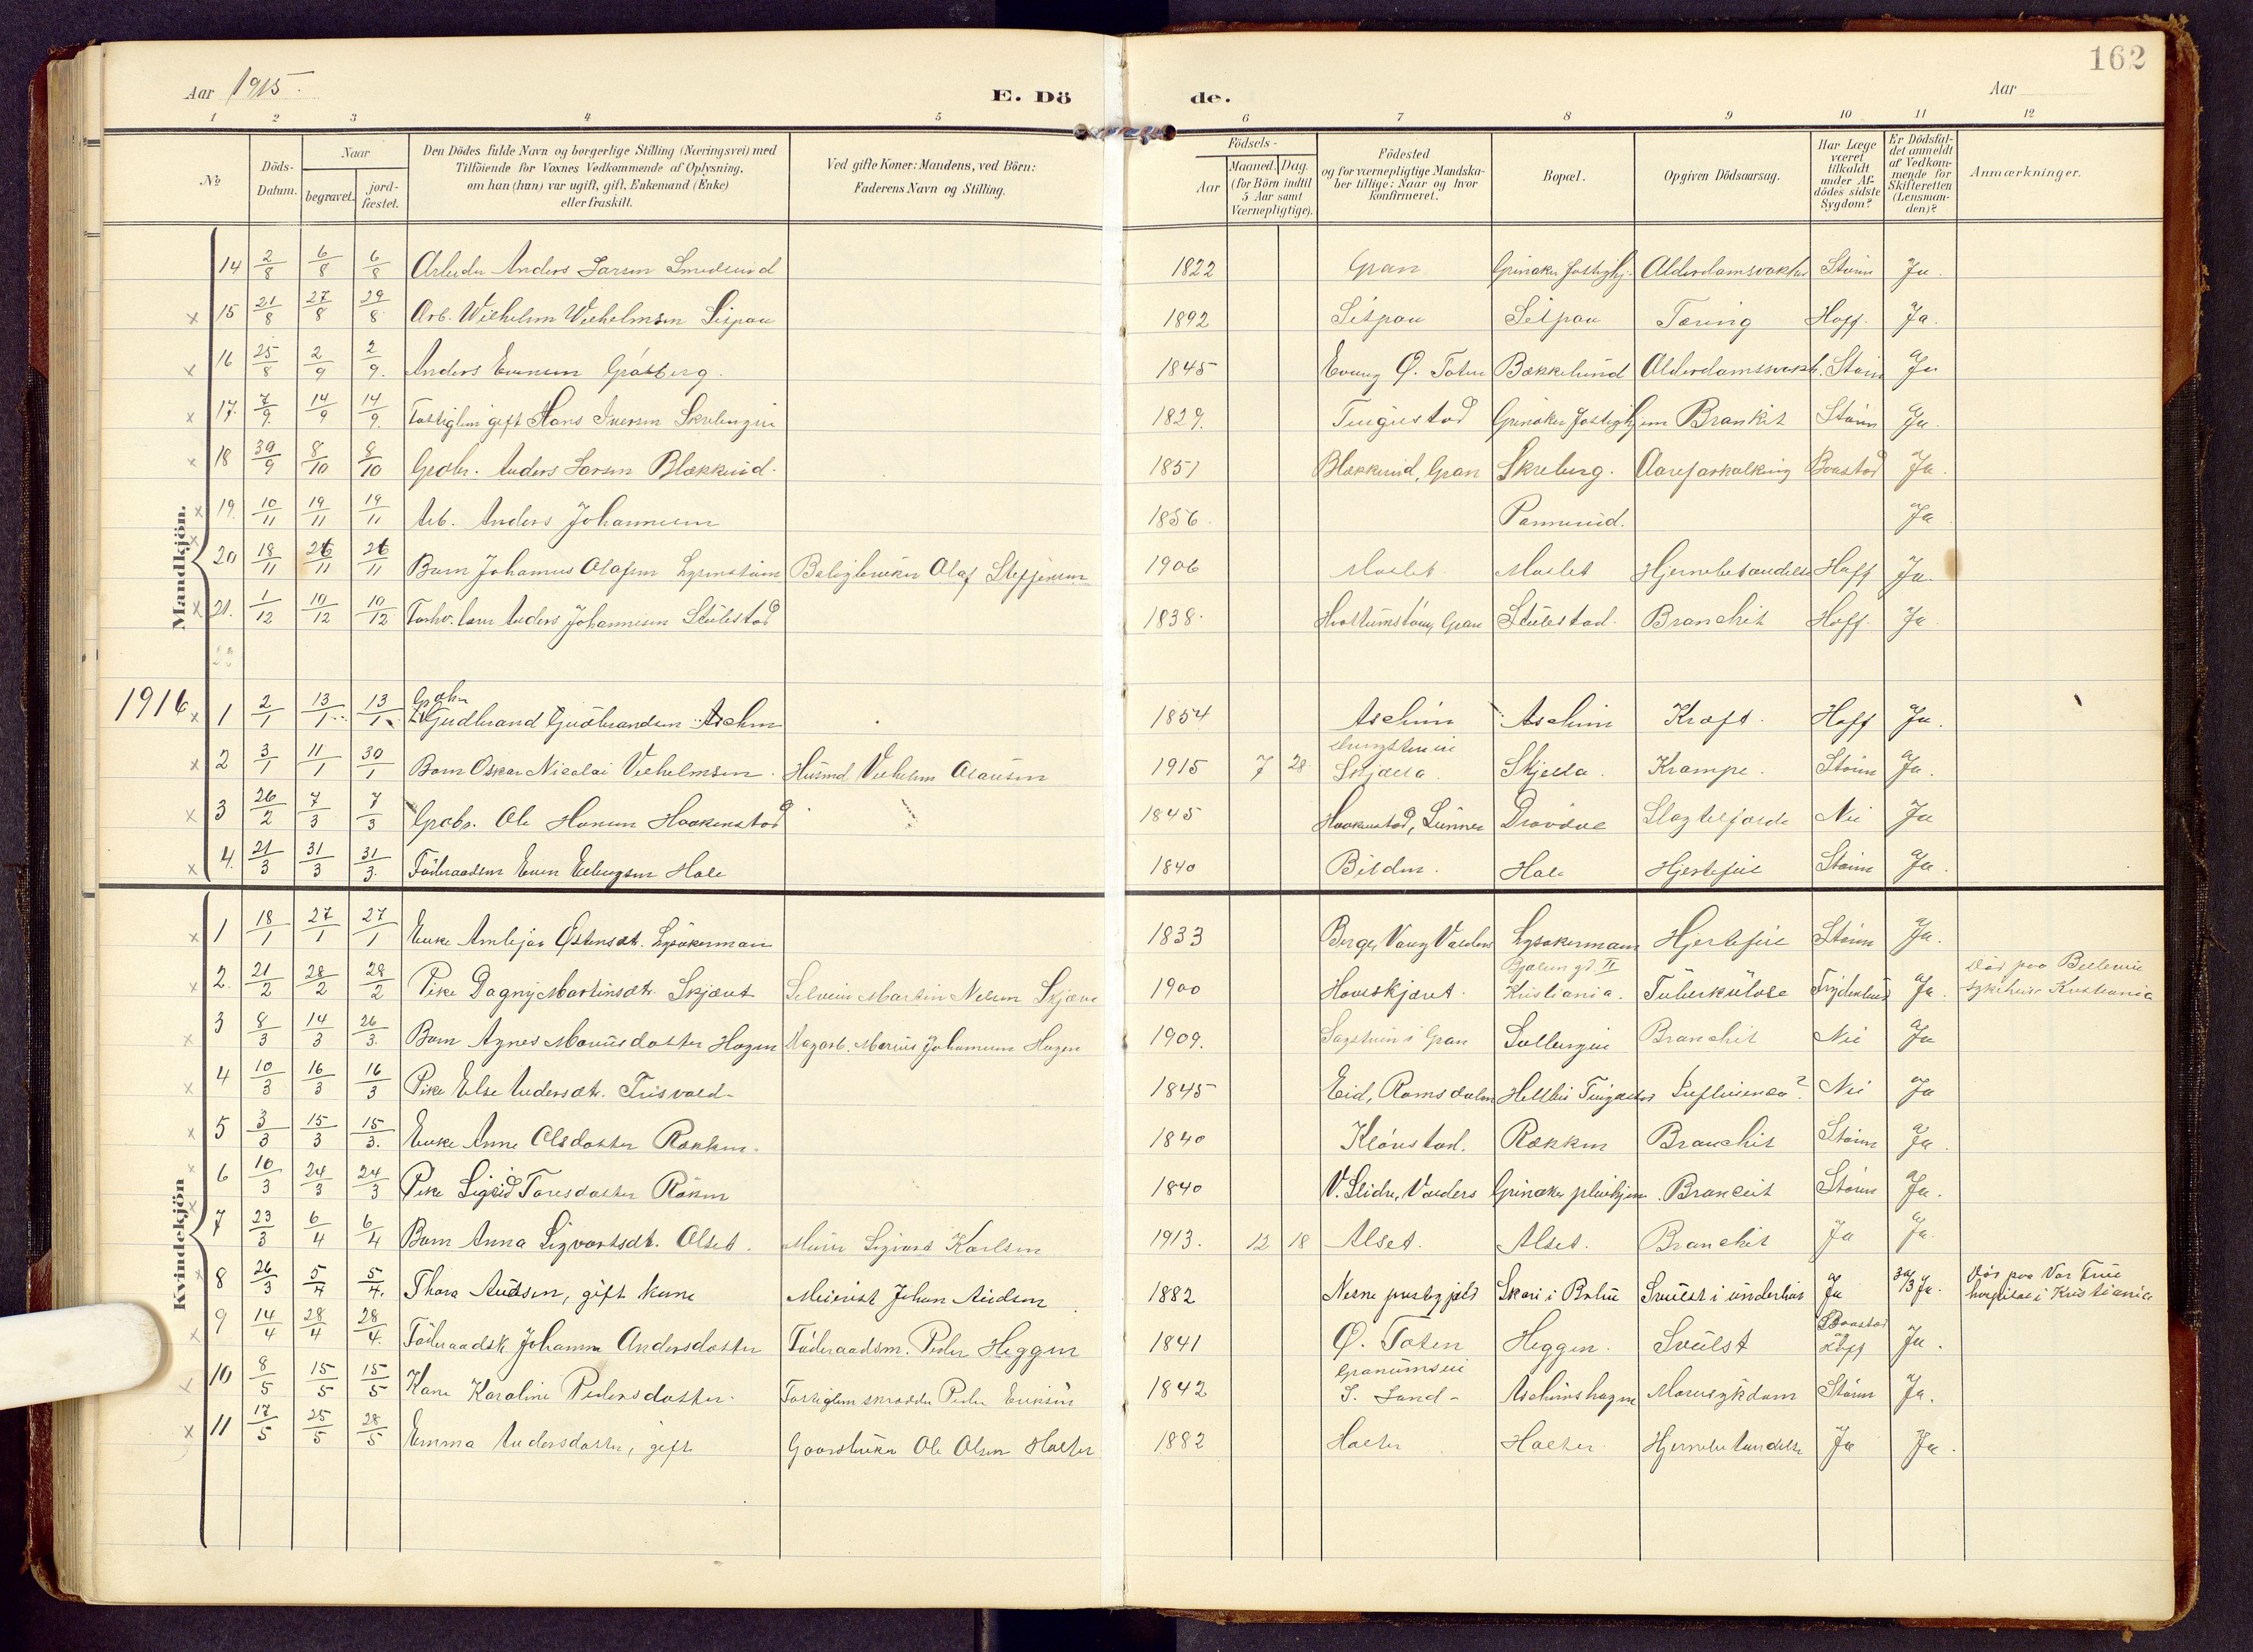 SAH, Brandbu prestekontor, Klokkerbok nr. 9, 1903-1916, s. 162